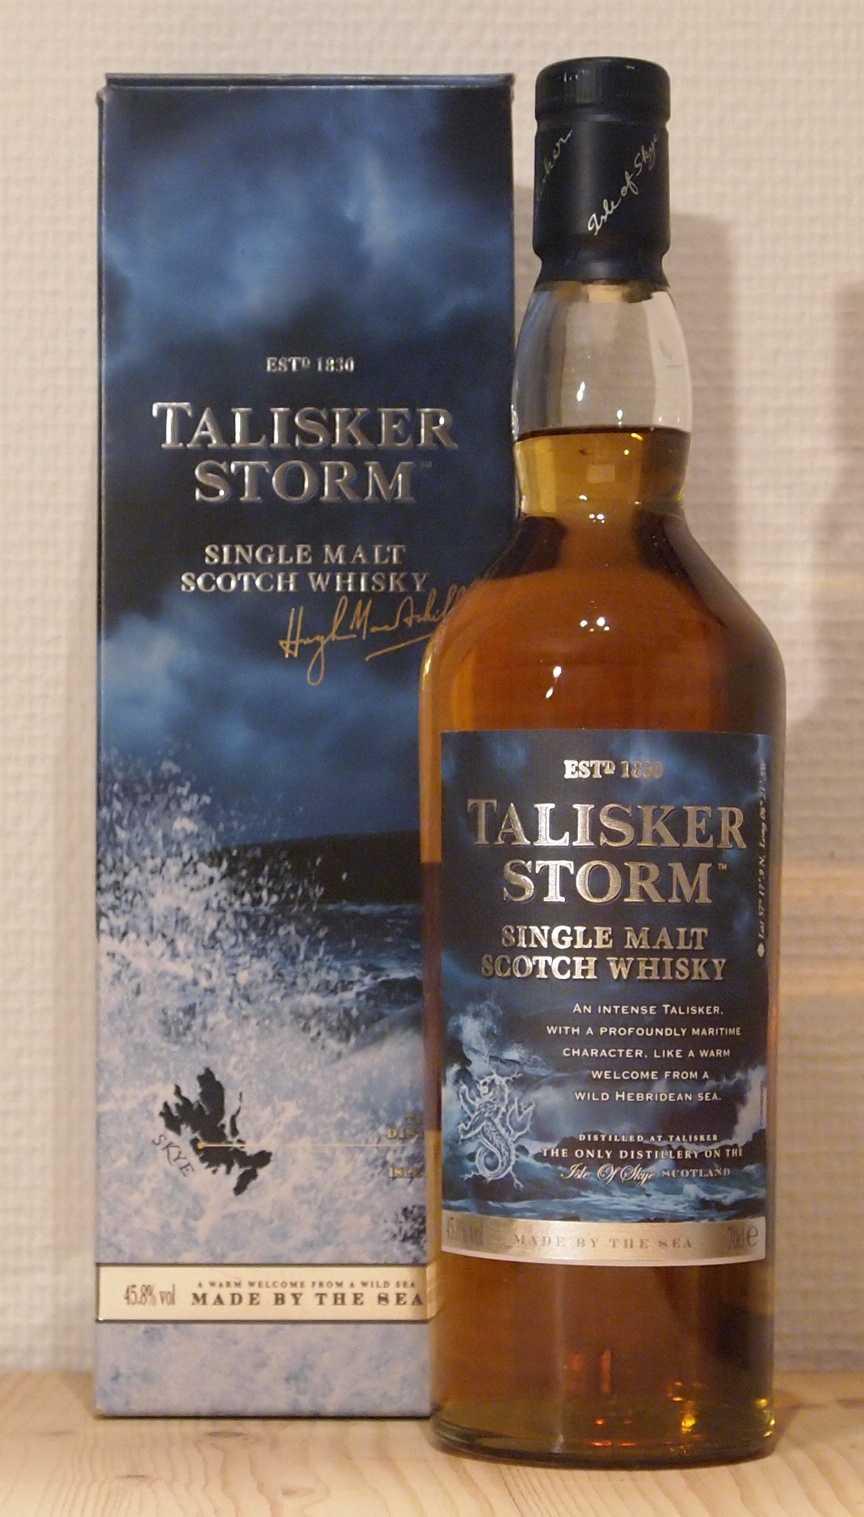 Whisky NAS Abfüllung Talisker Storm